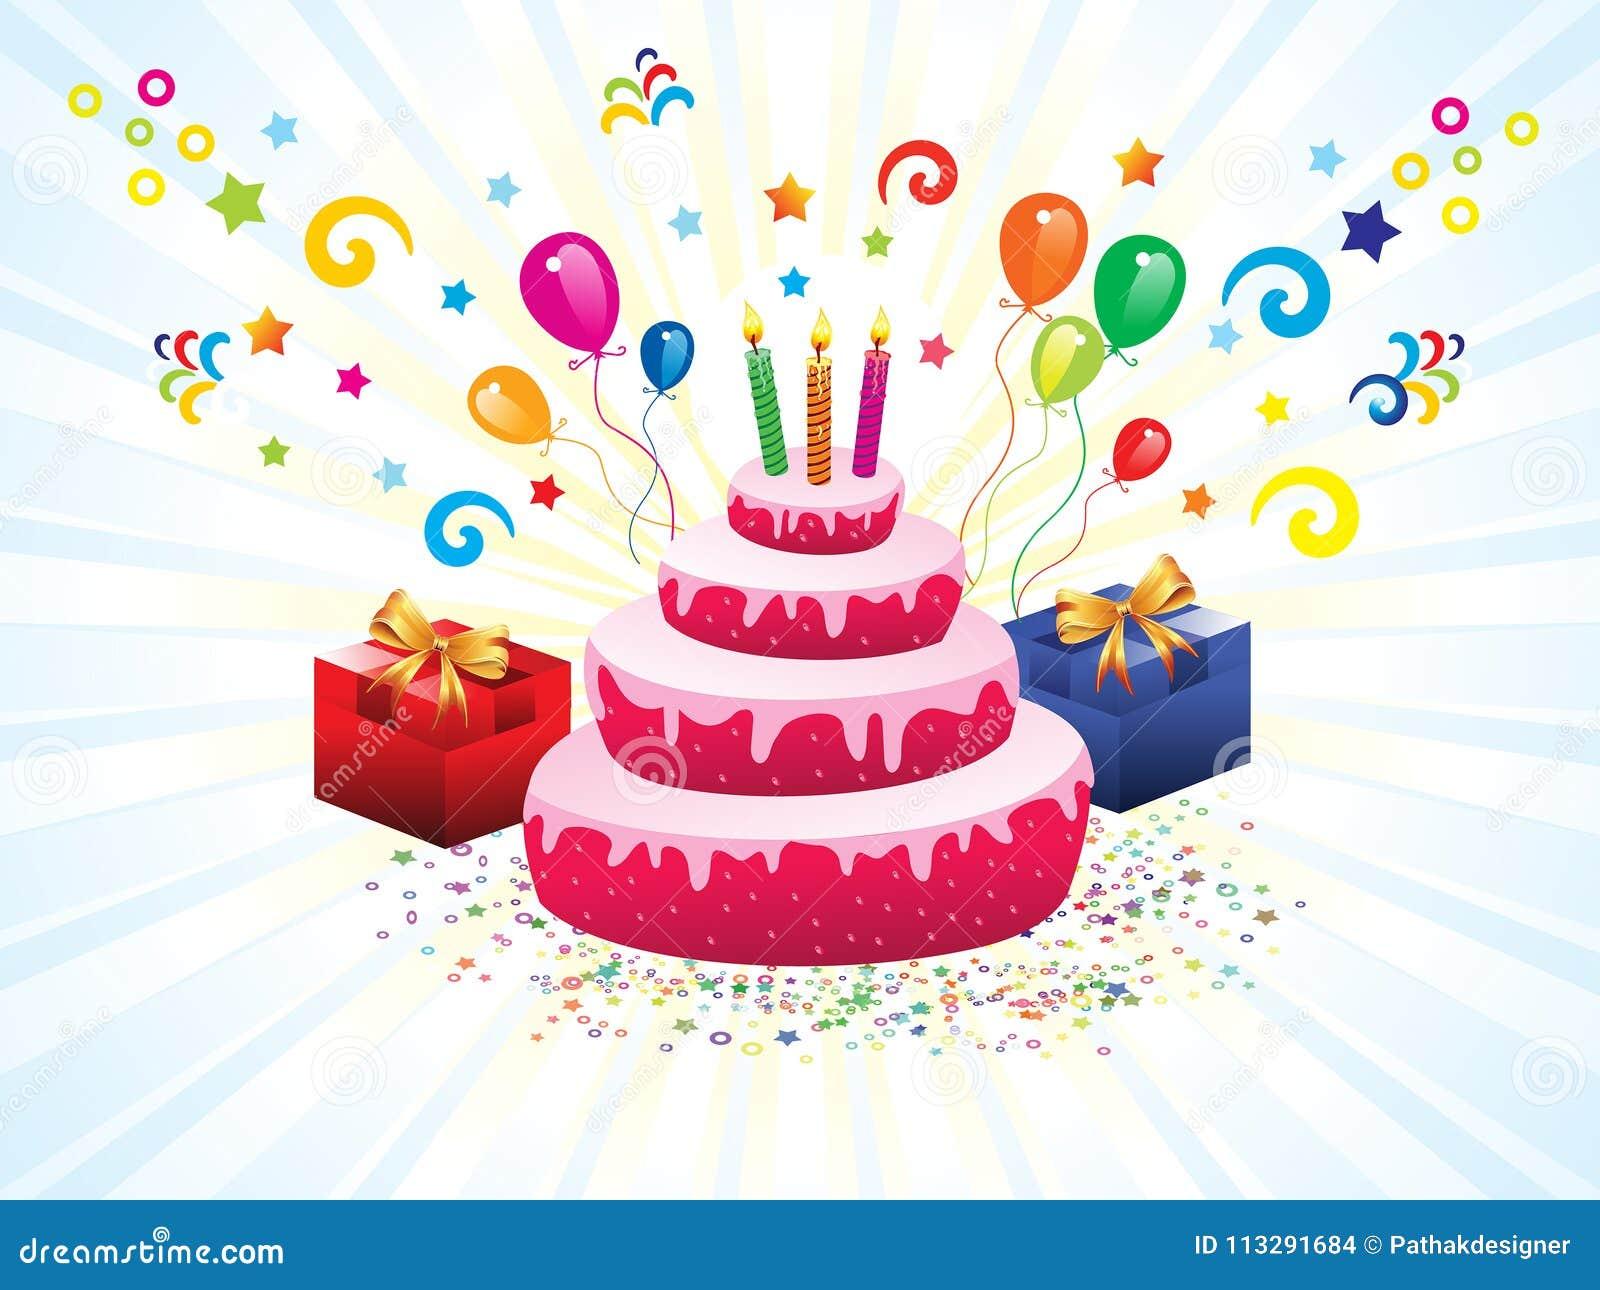 Amazing Abstract Artistic Creative Birthday Cake Stock Vector Funny Birthday Cards Online Hetedamsfinfo